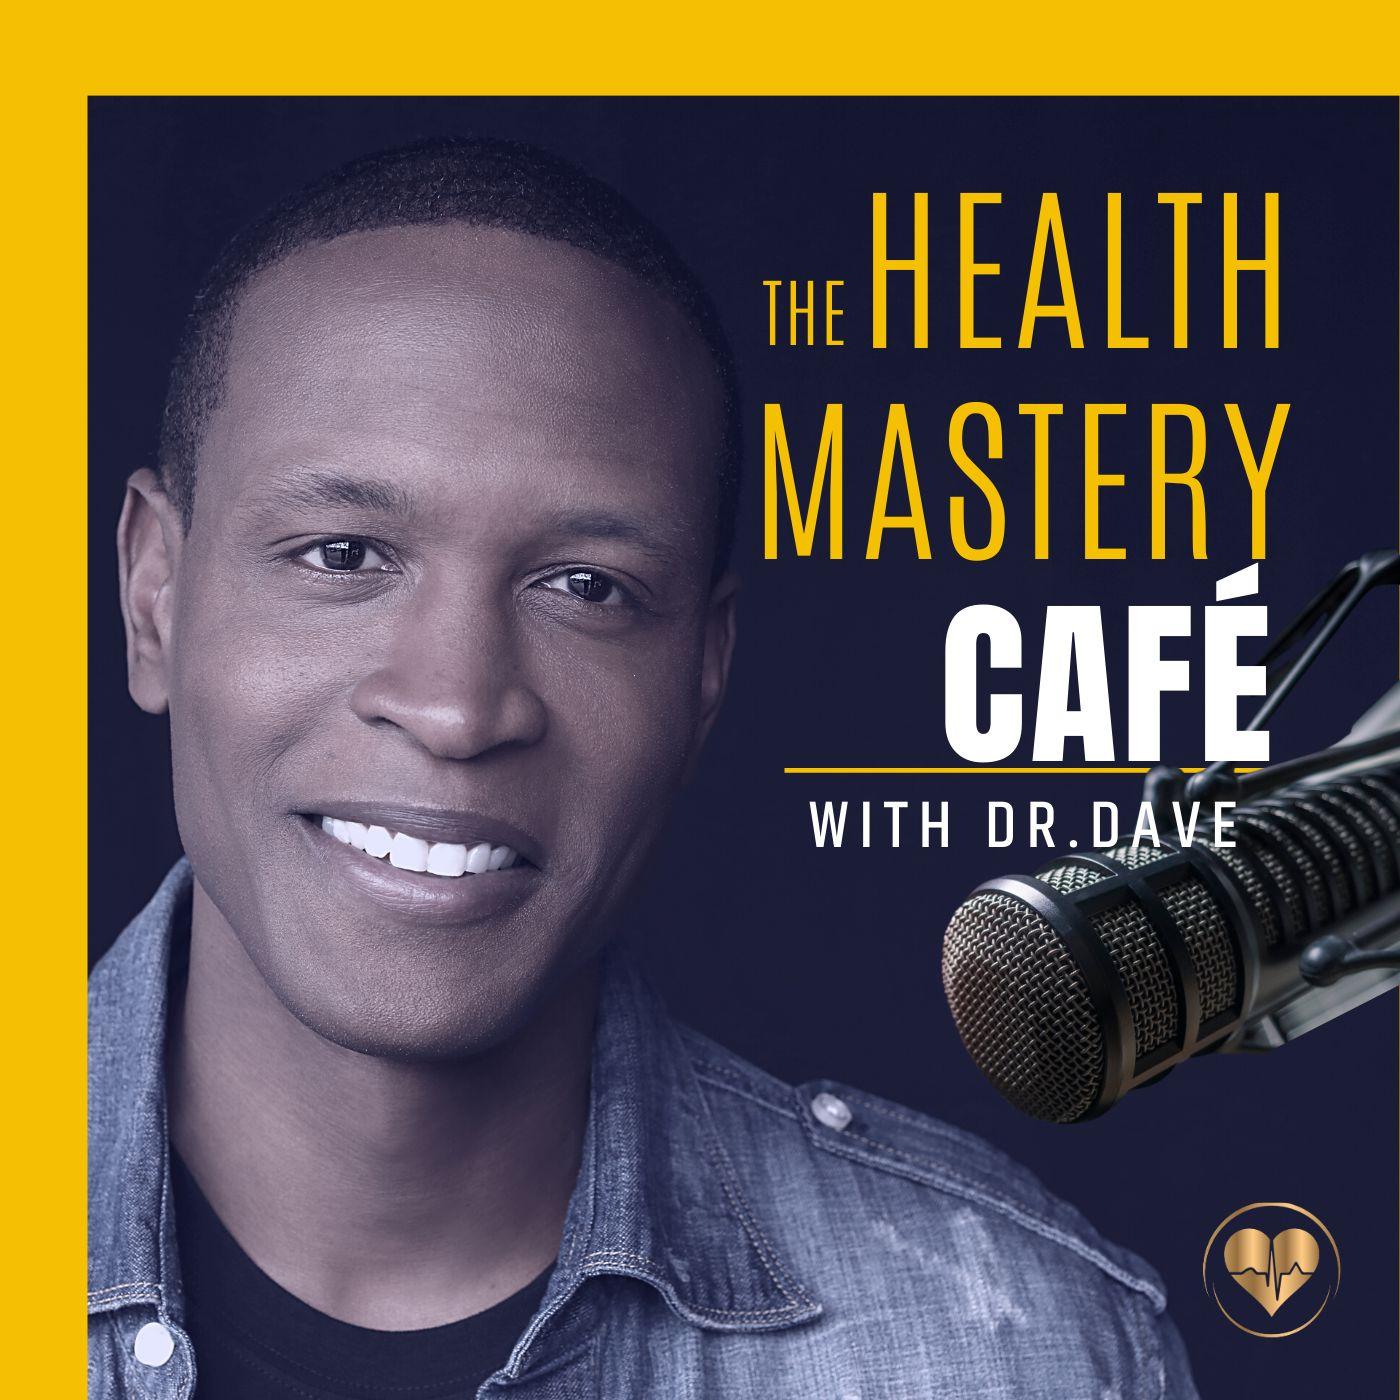 The Health Mastery Café with Dr. Dave